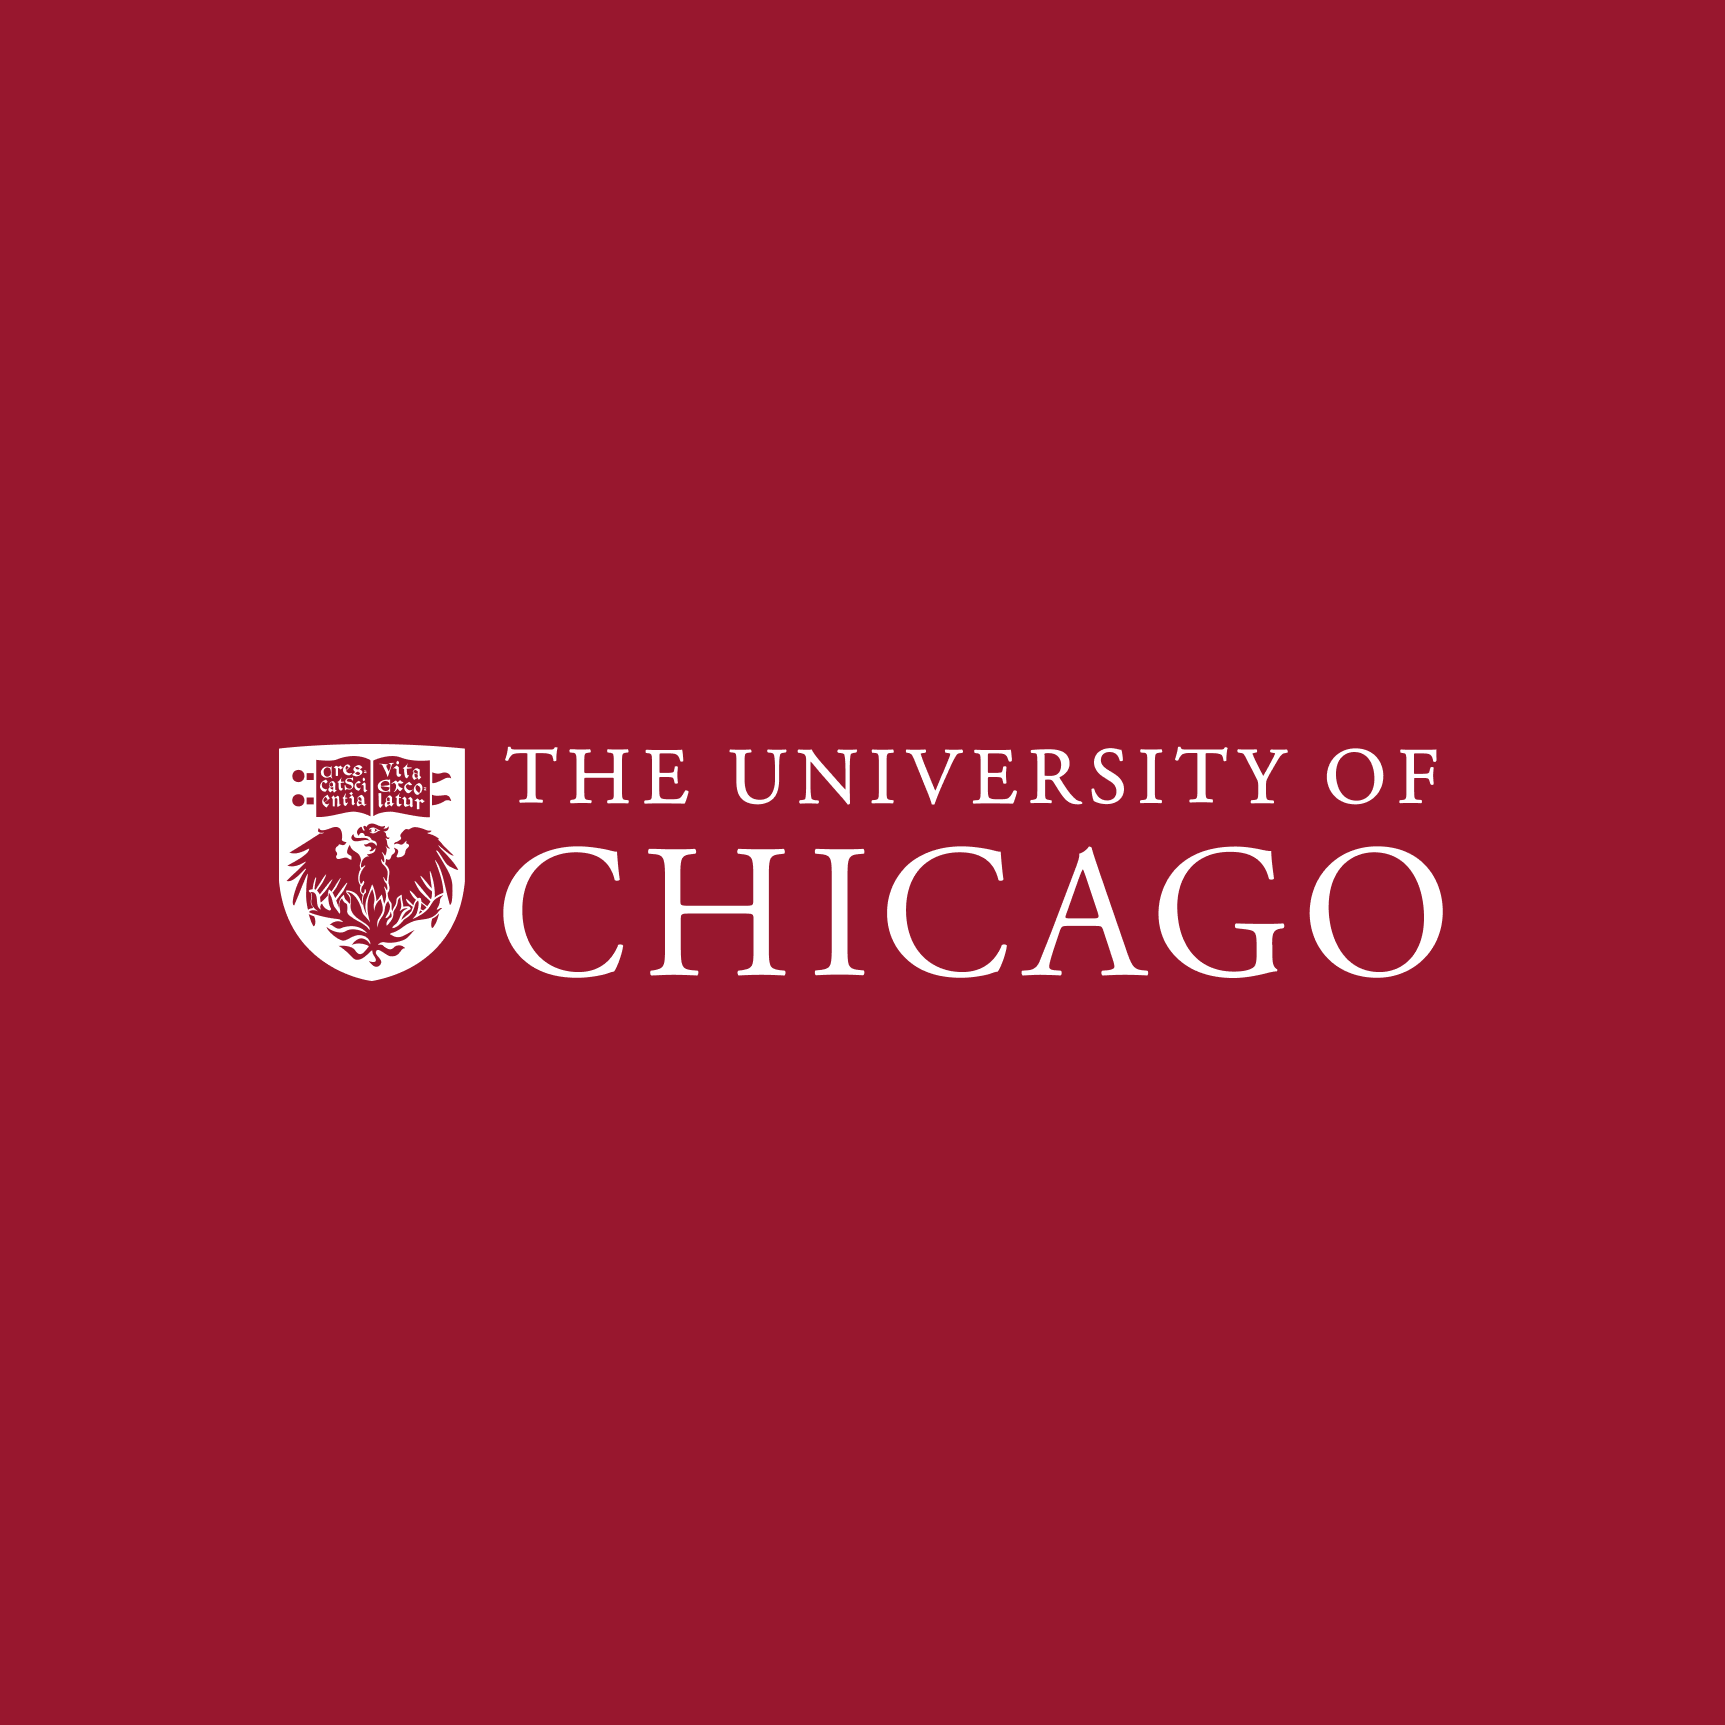 The University of Chicago Logo